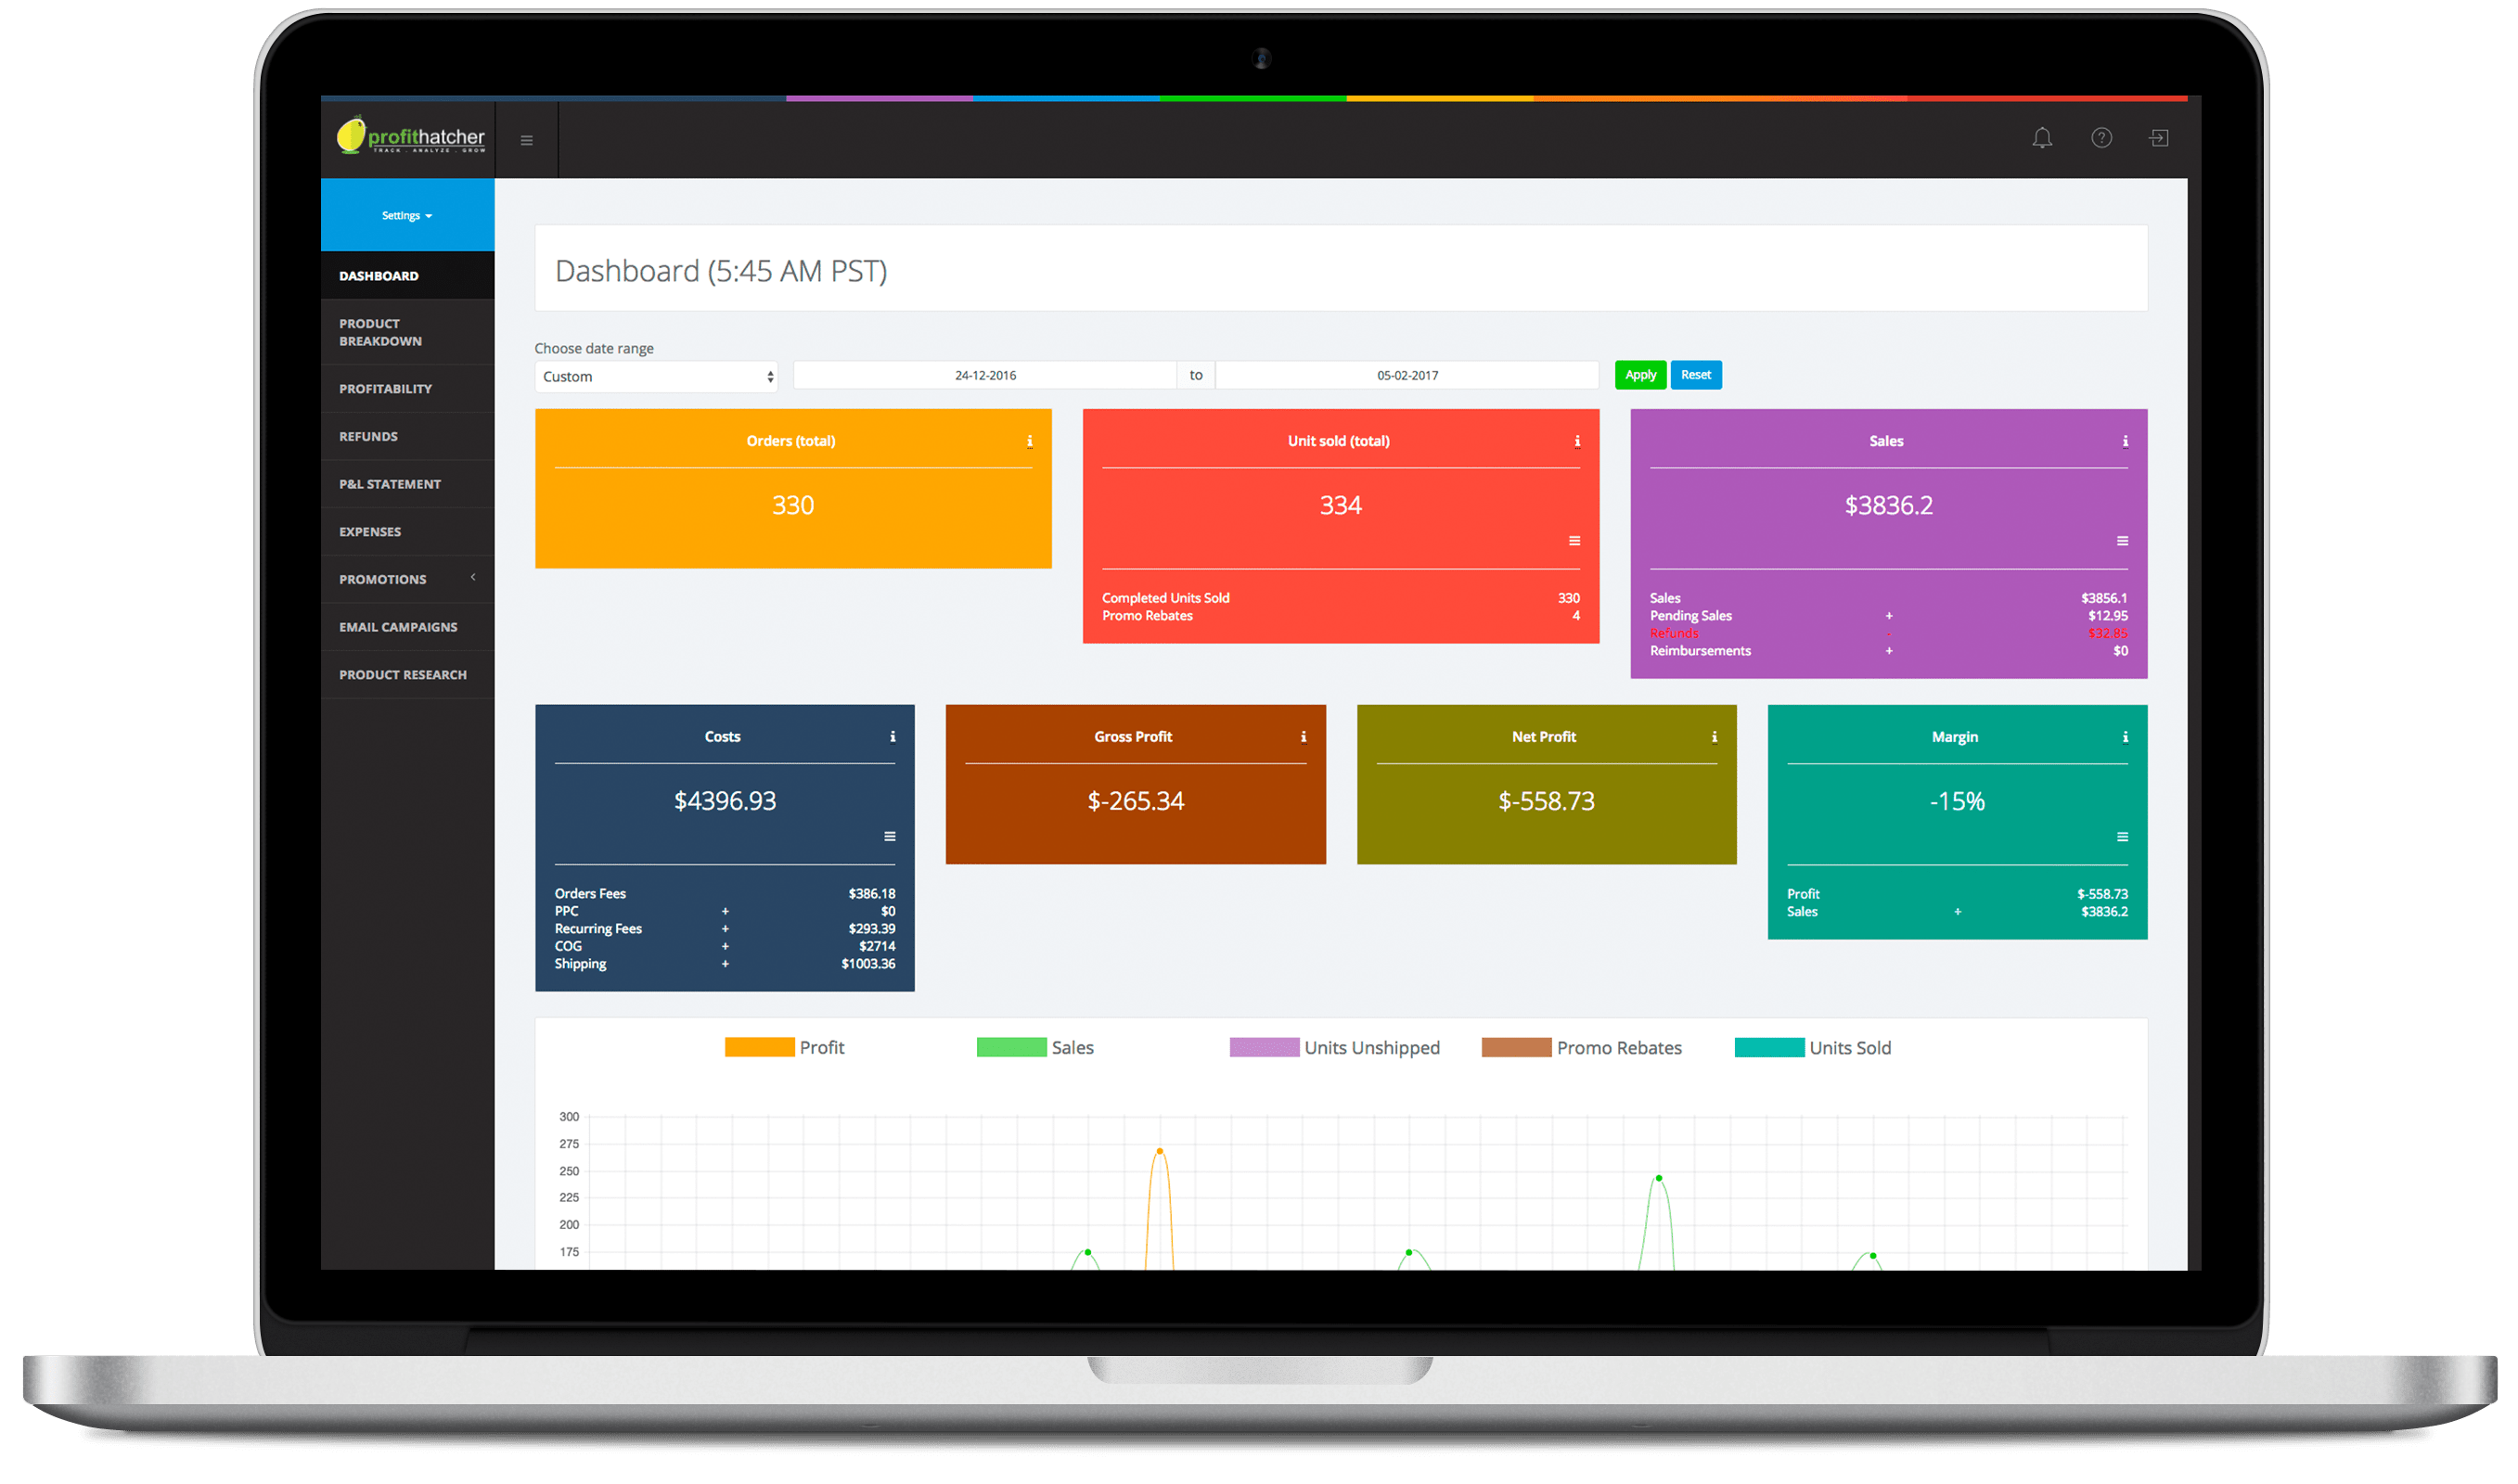 amazon-sales-improvement-service